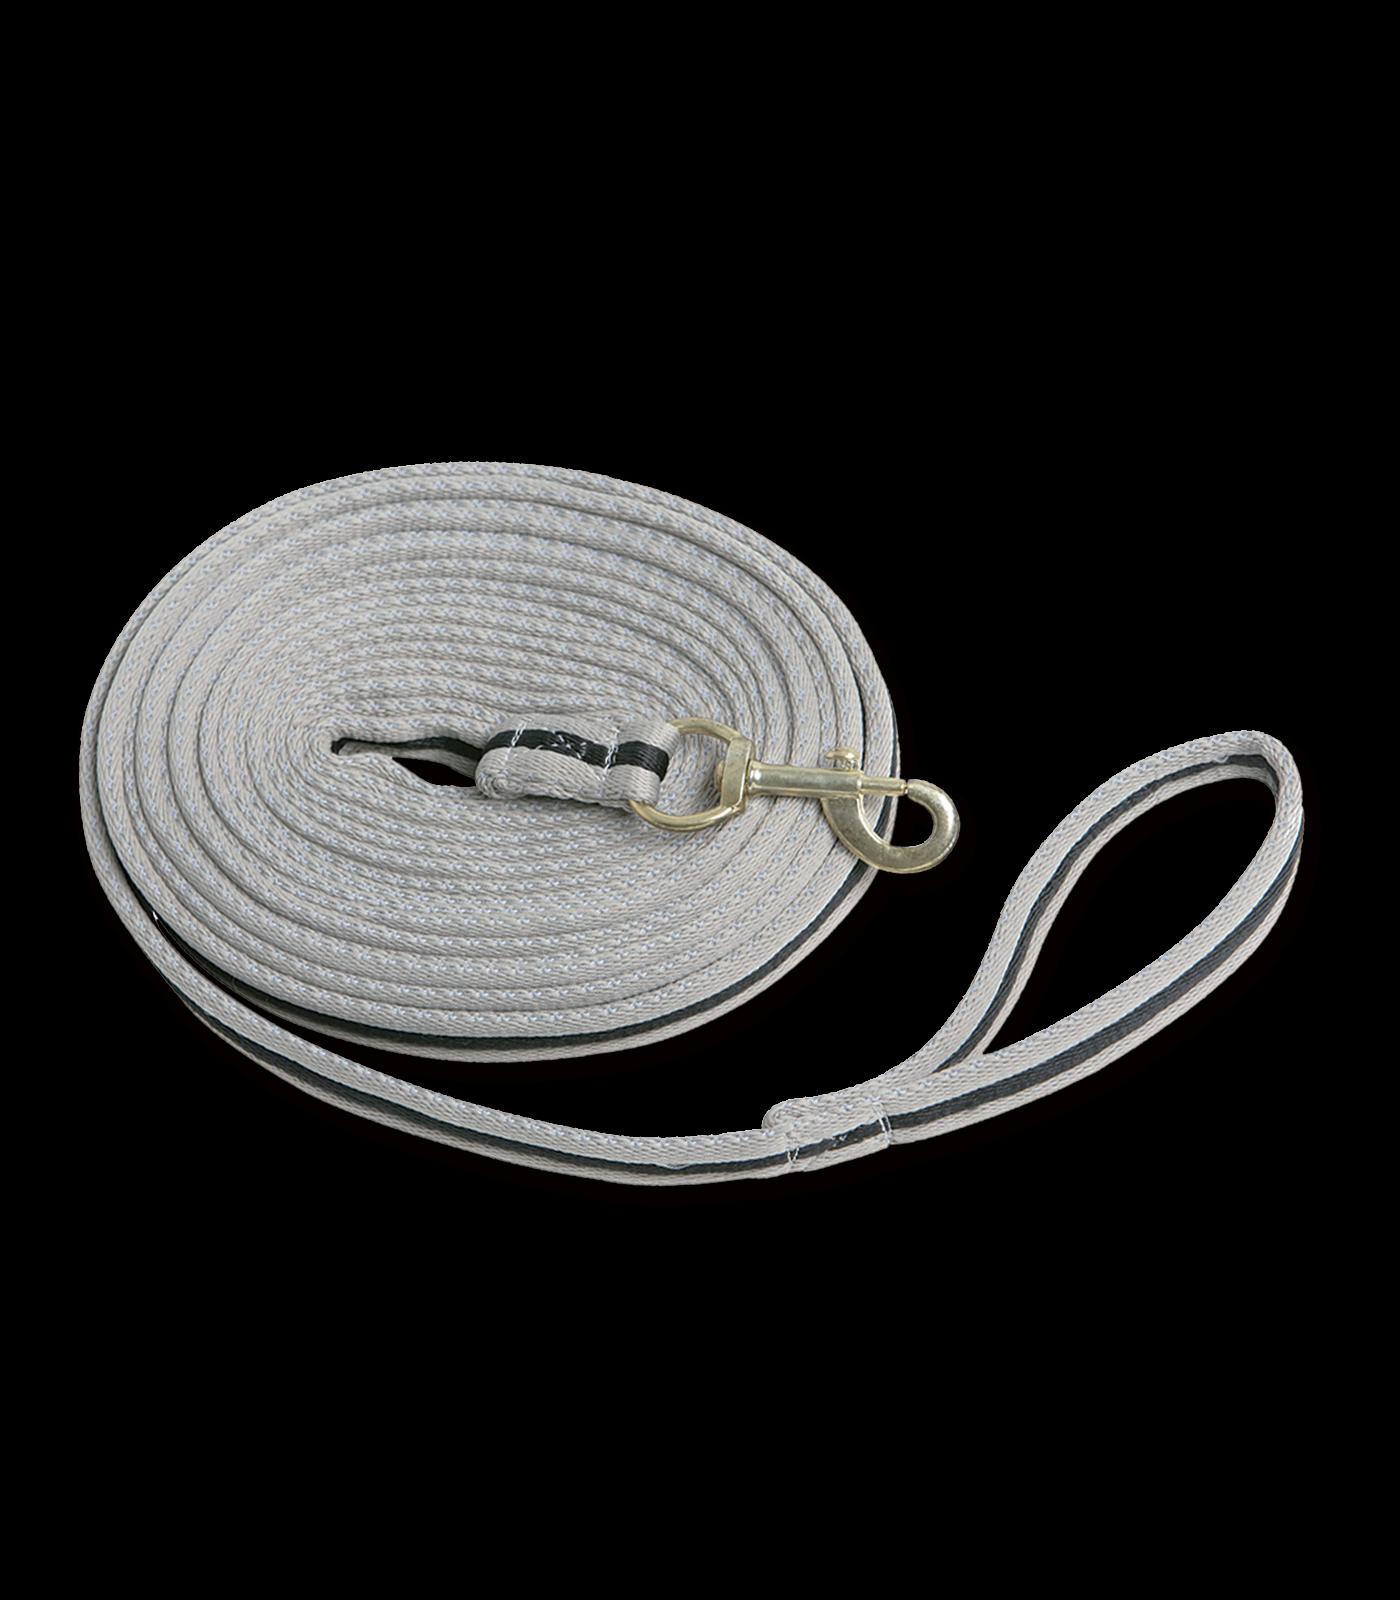 8 Gr Cross-Lock Shnap Trippel Sicherheits-Wirbel